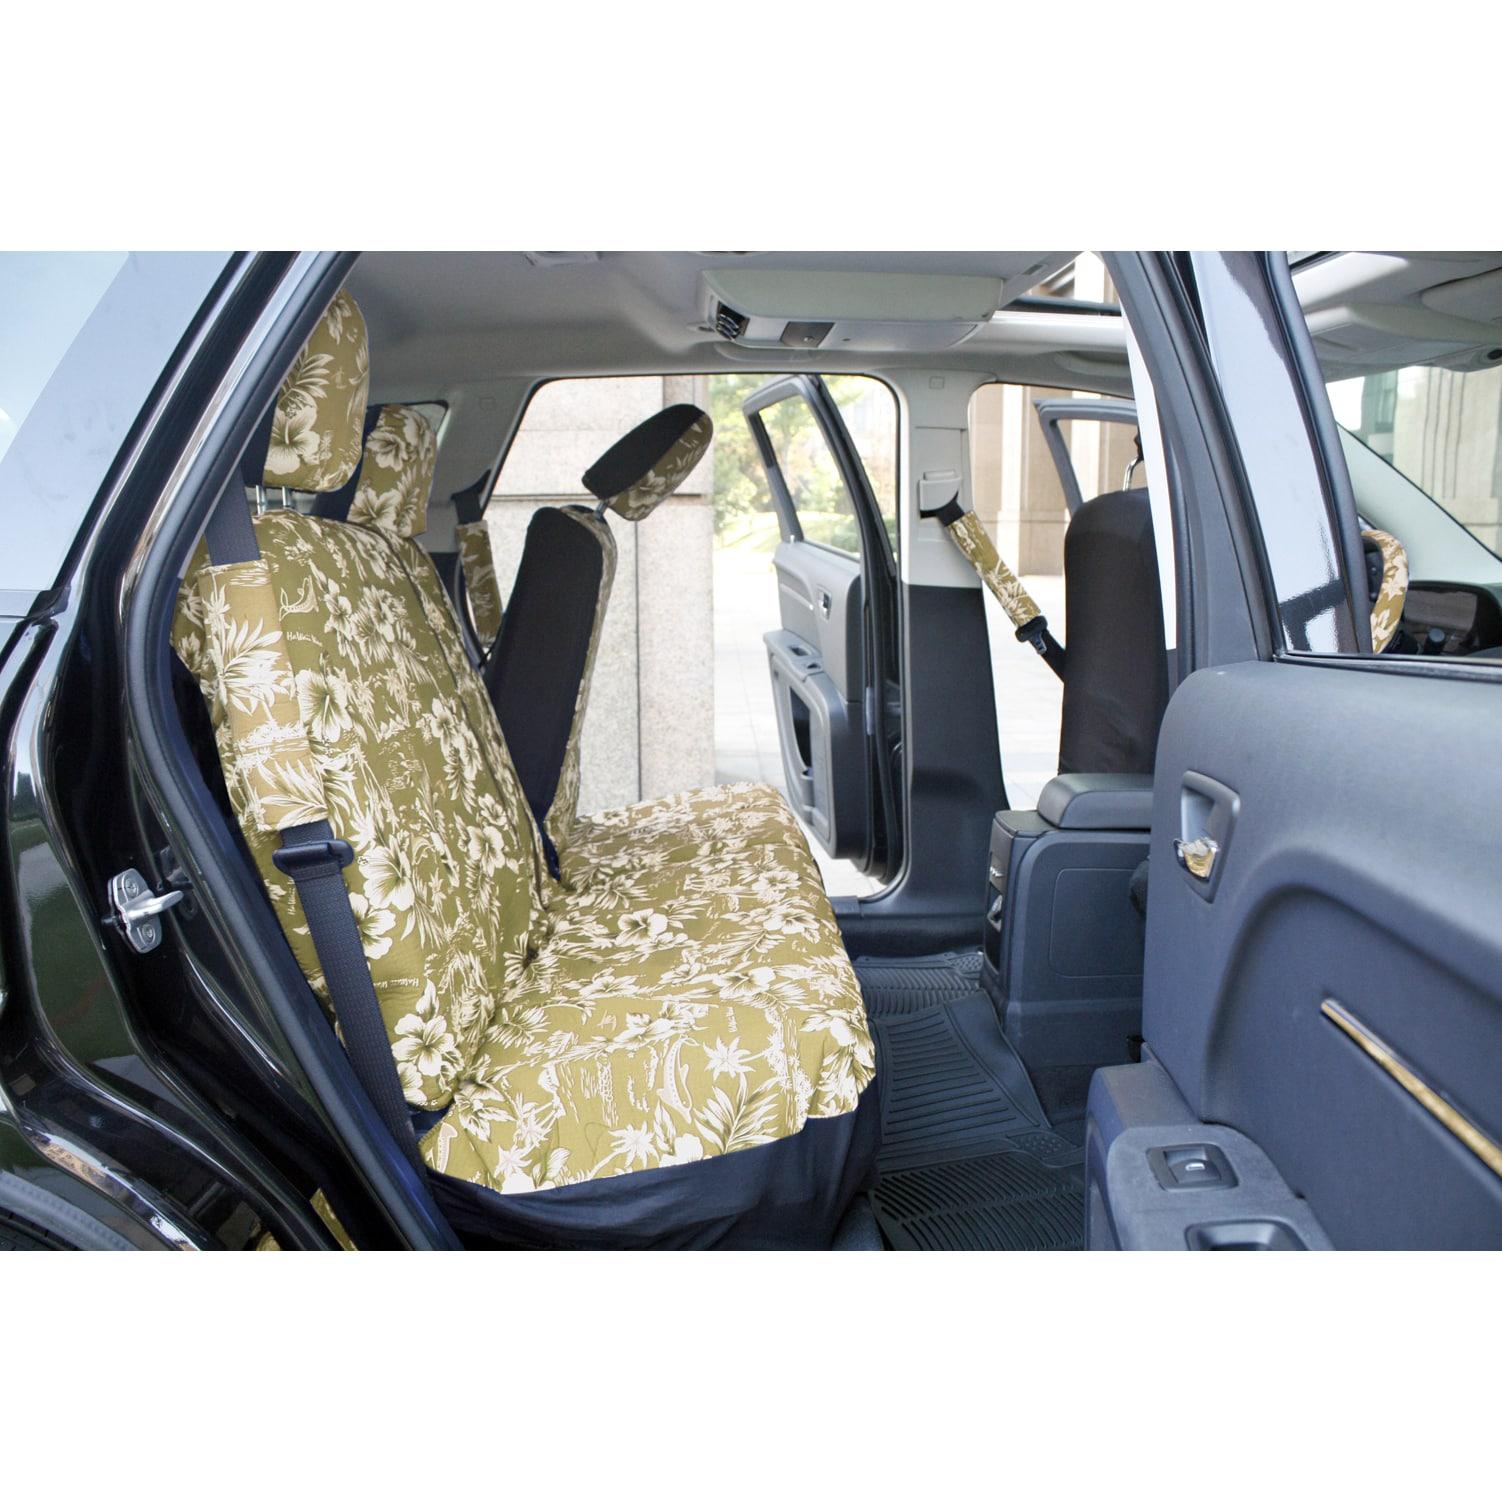 Oxgord hawaii beige tan 17 piece seat cover set with hawaiian oxgord hawaii beige tan 17 piece seat cover set with hawaiian hibiscus flowers free shipping on orders over 45 overstock 16009650 izmirmasajfo Choice Image